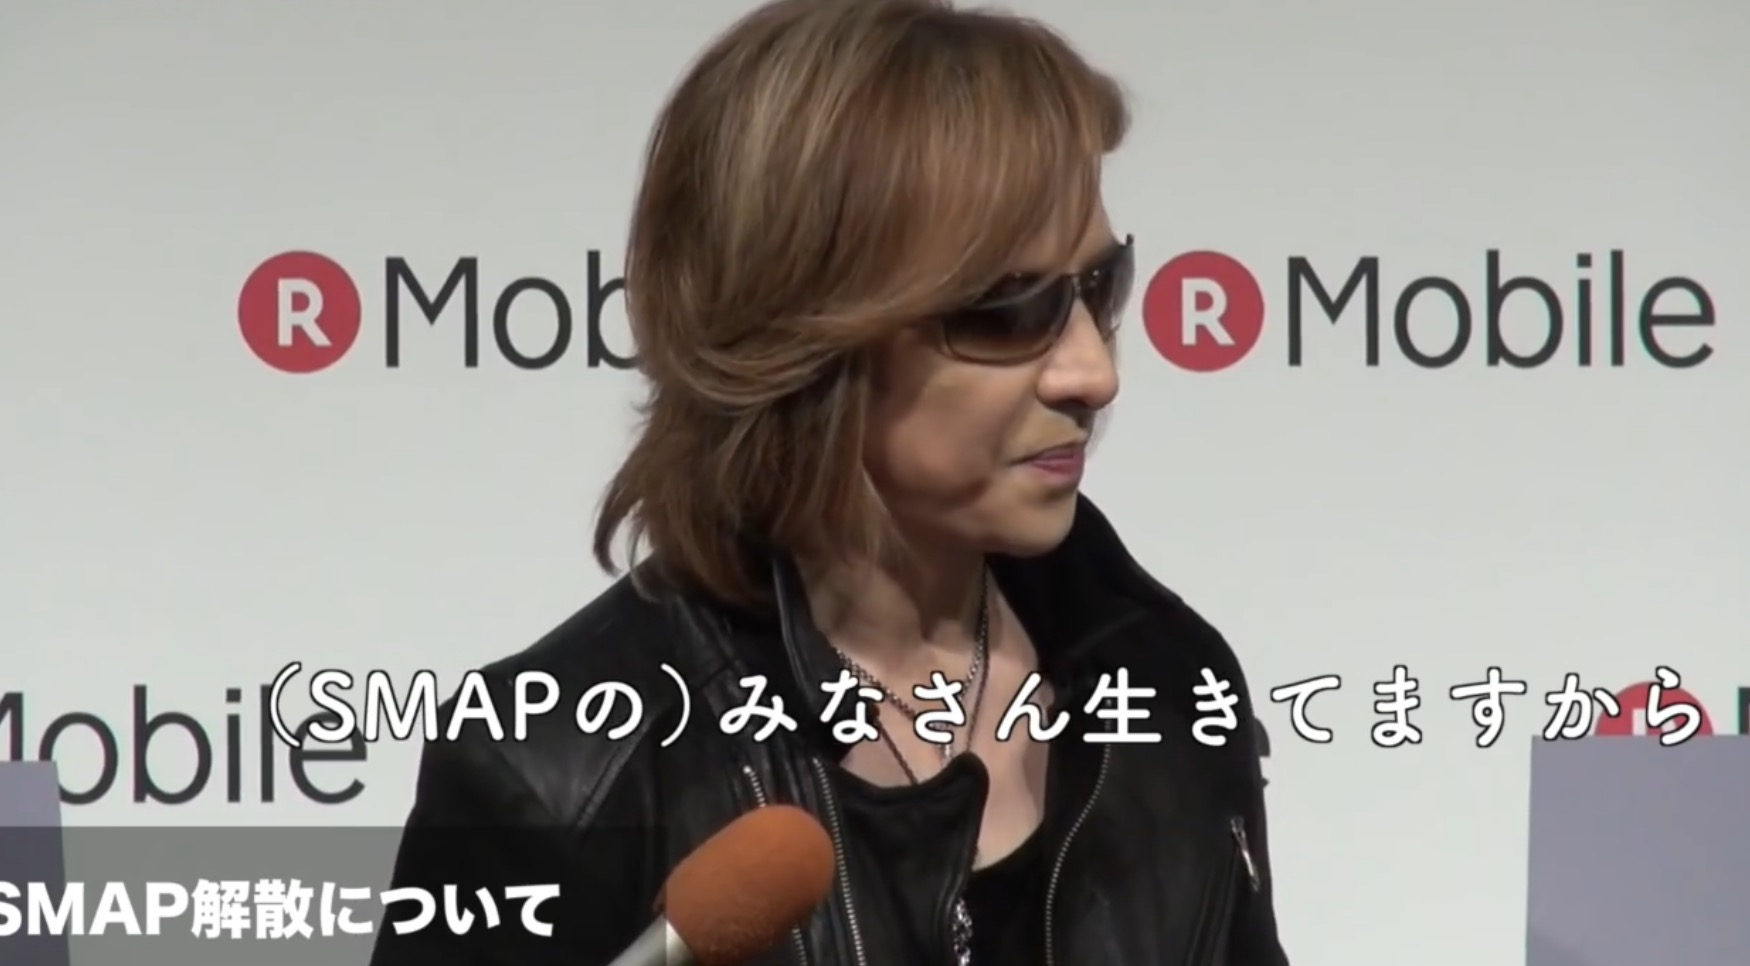 YOSHIKI、SMAP解散へのコメントが話題に!SMAP以上の苦境を乗り越えてきたYOSHIKIの言葉が刺さる。